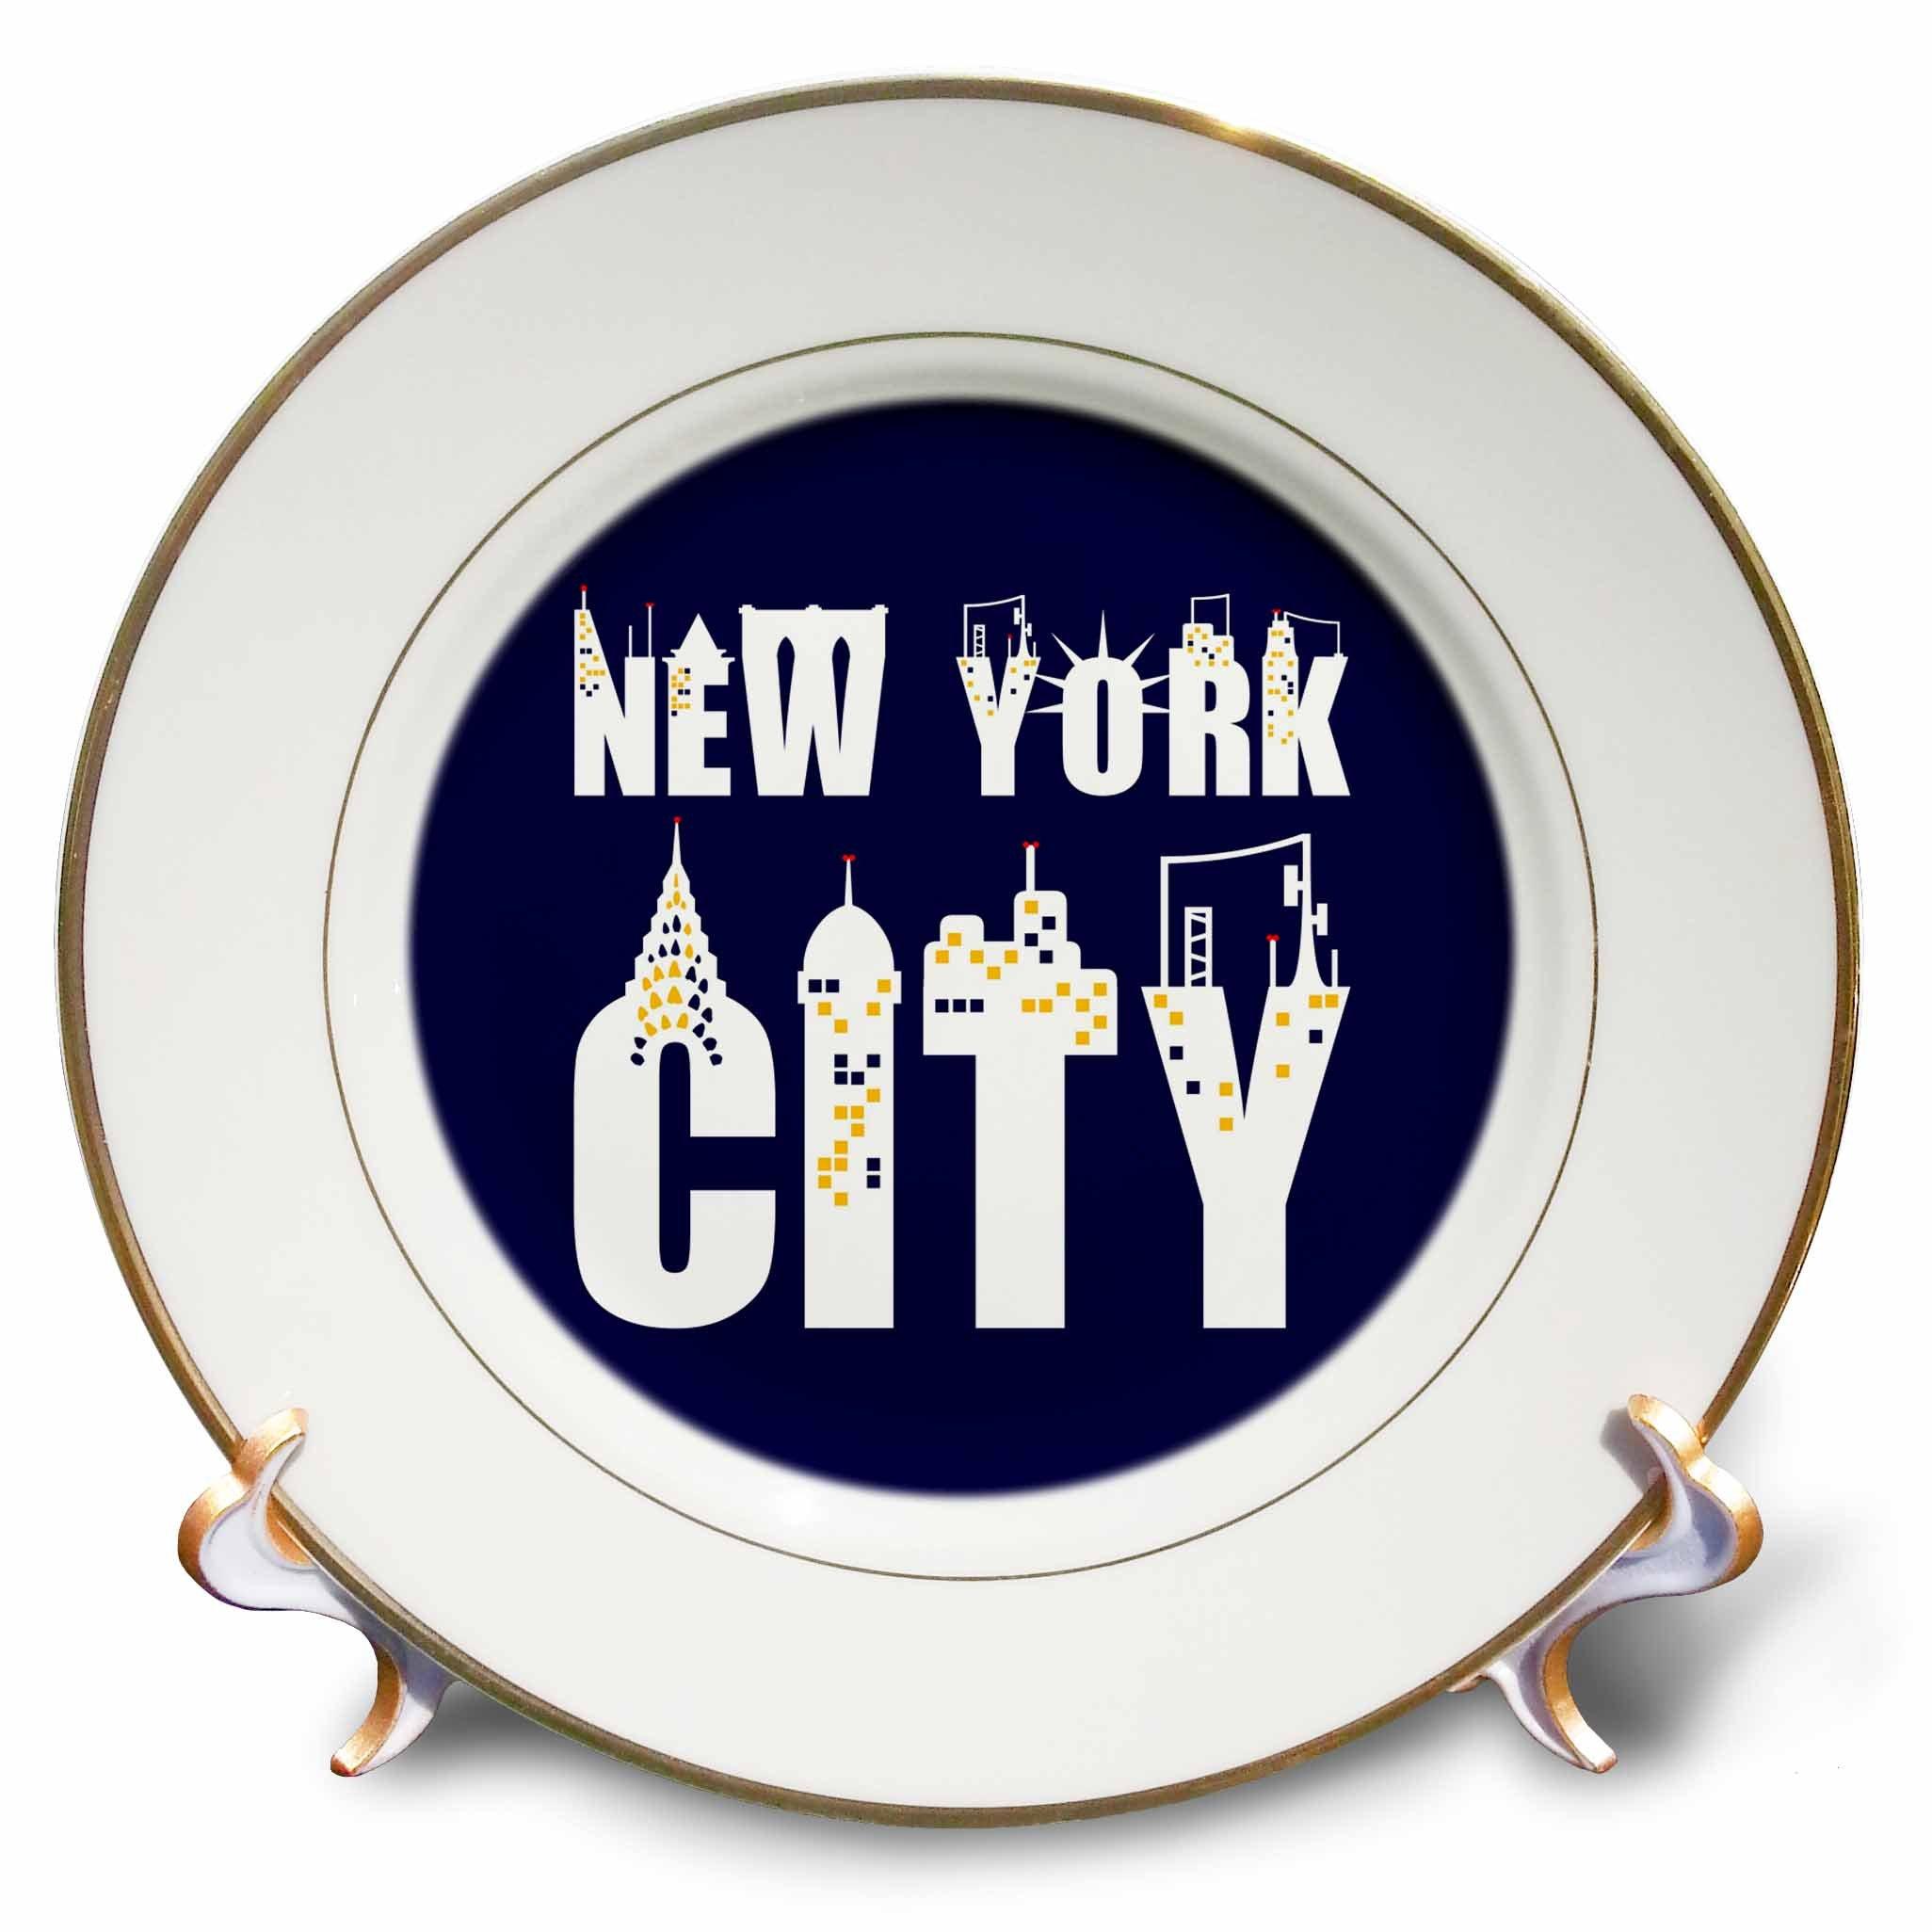 3dRose Alexis Design - American Cities - Elegant text New York City, landmarks, shining windows on blue - 8 inch Porcelain Plate (cp_286455_1)